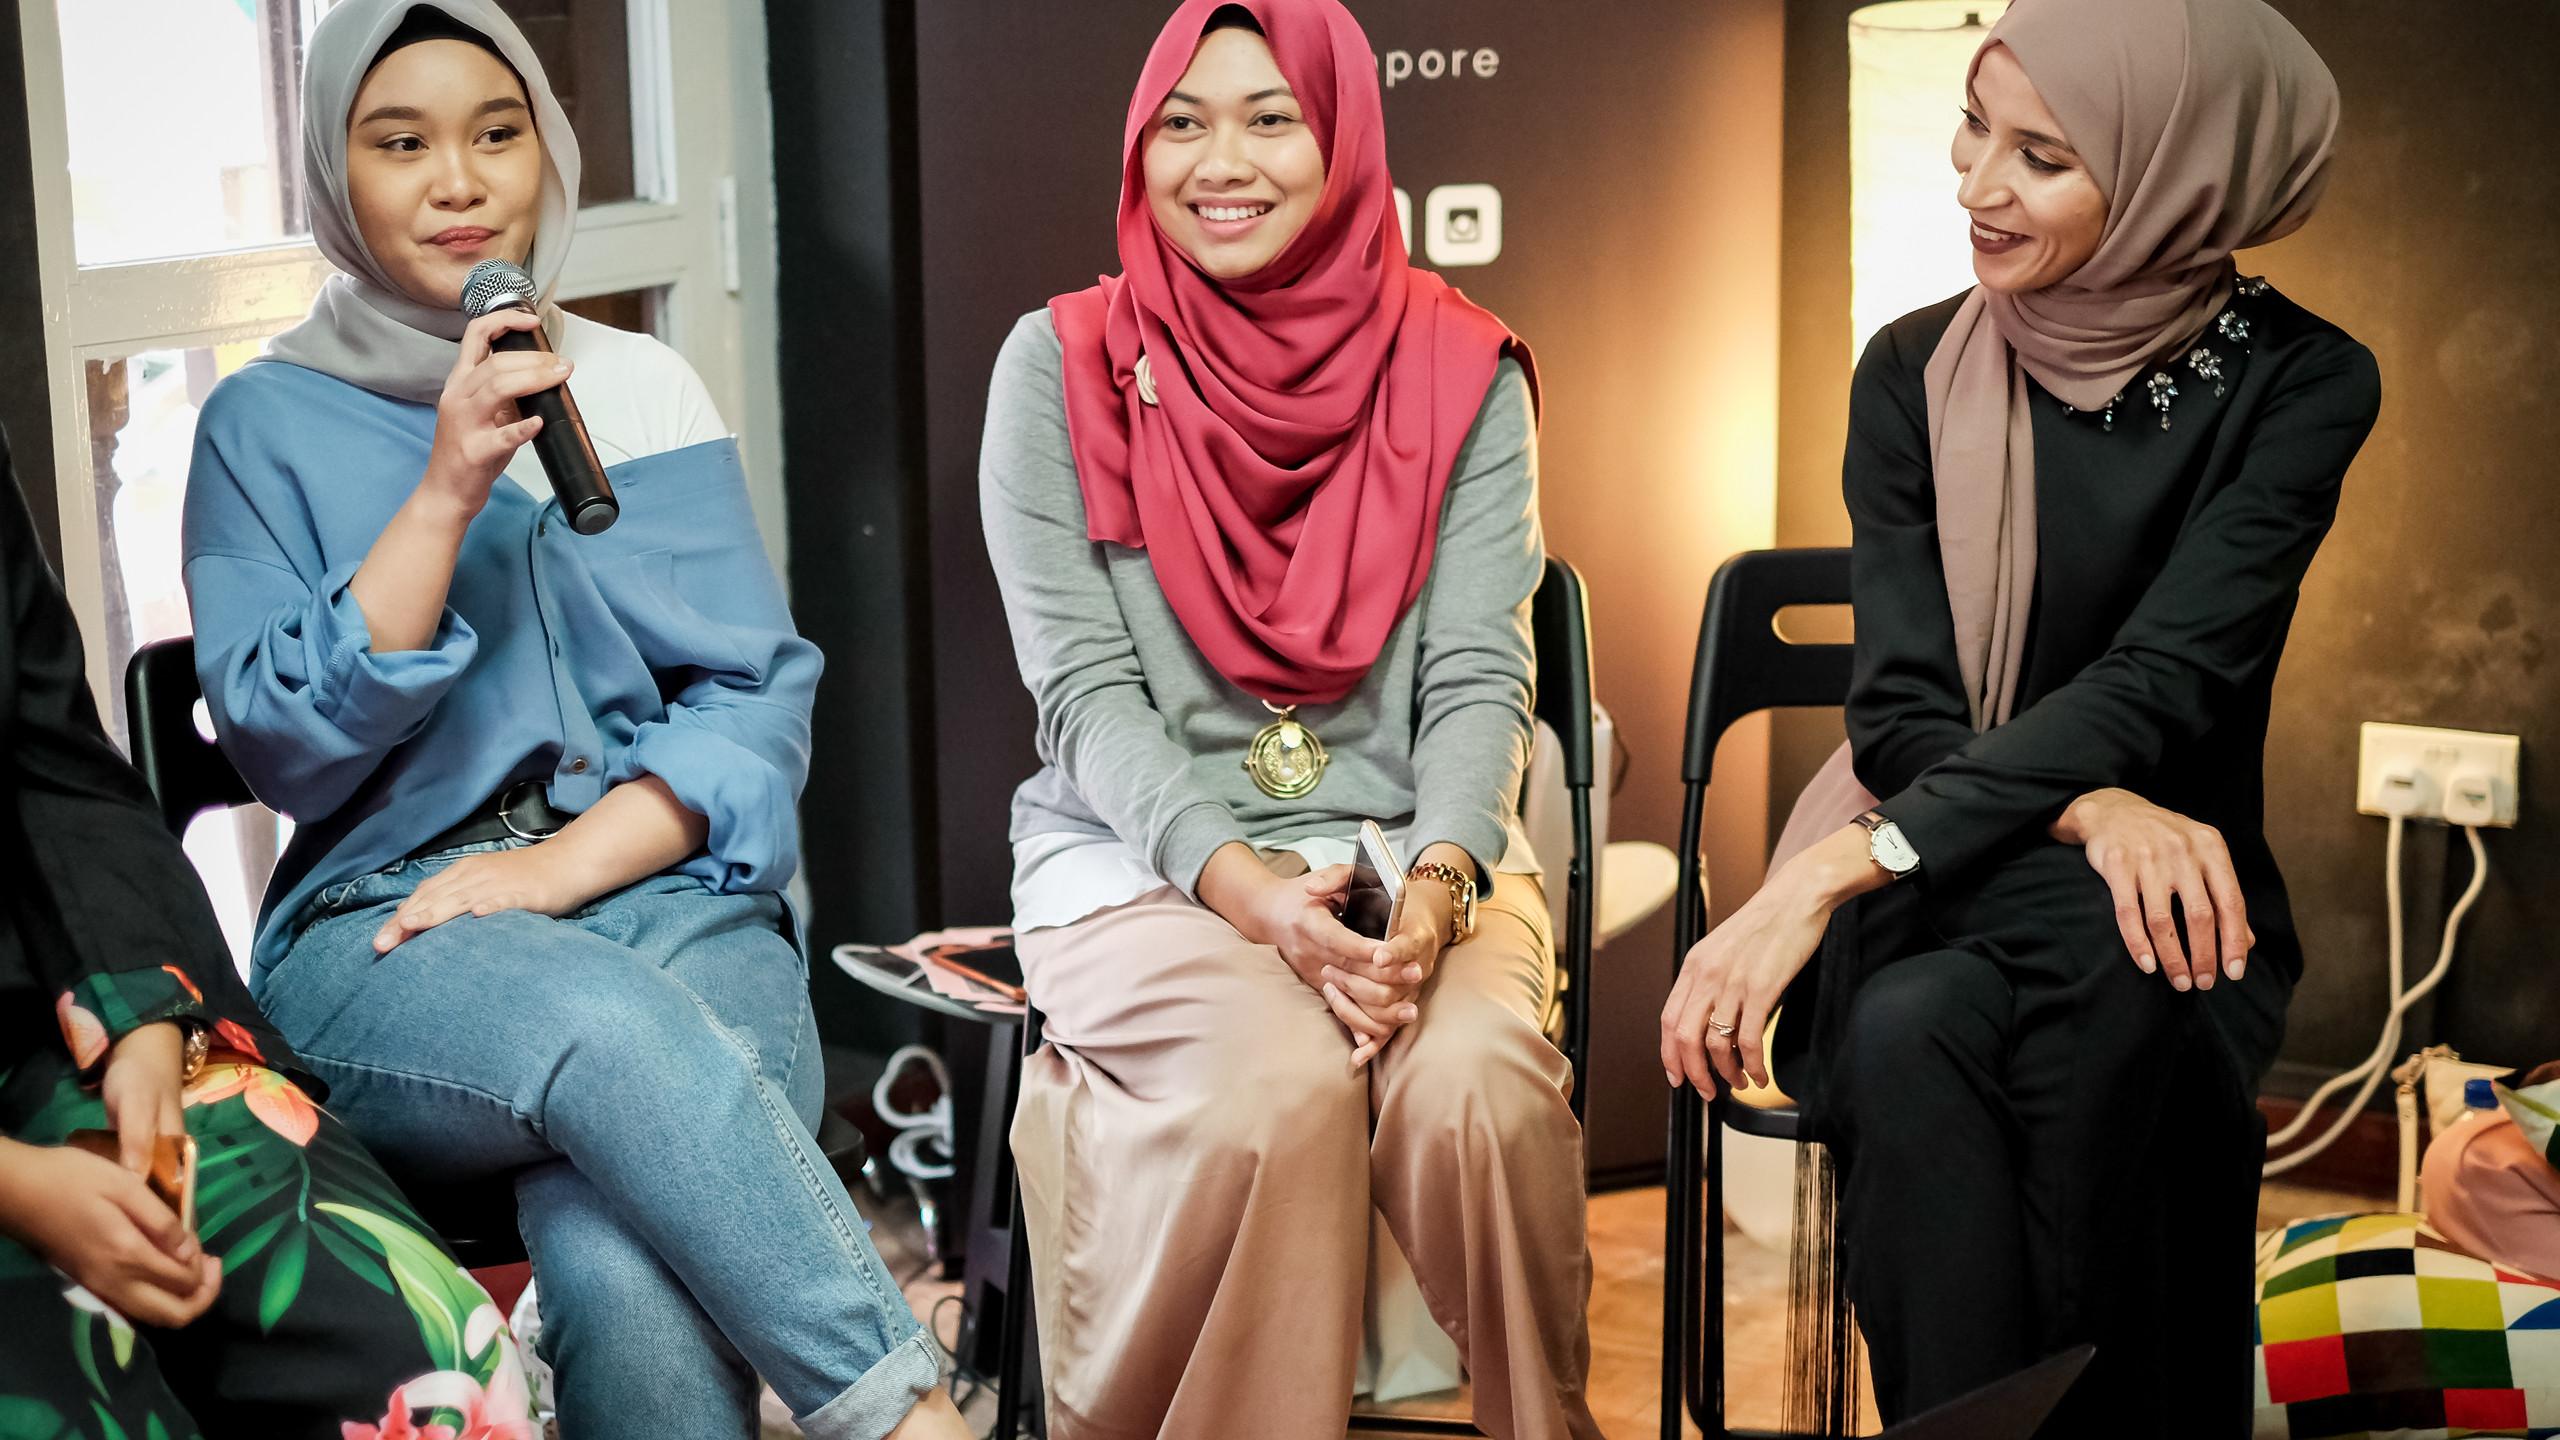 Left to right: Tayeba, bloggers Tiq @automatiqhigh, Nur Fatiin @nurfatiin, Nadya Abd @nadyawesome, Hasna B